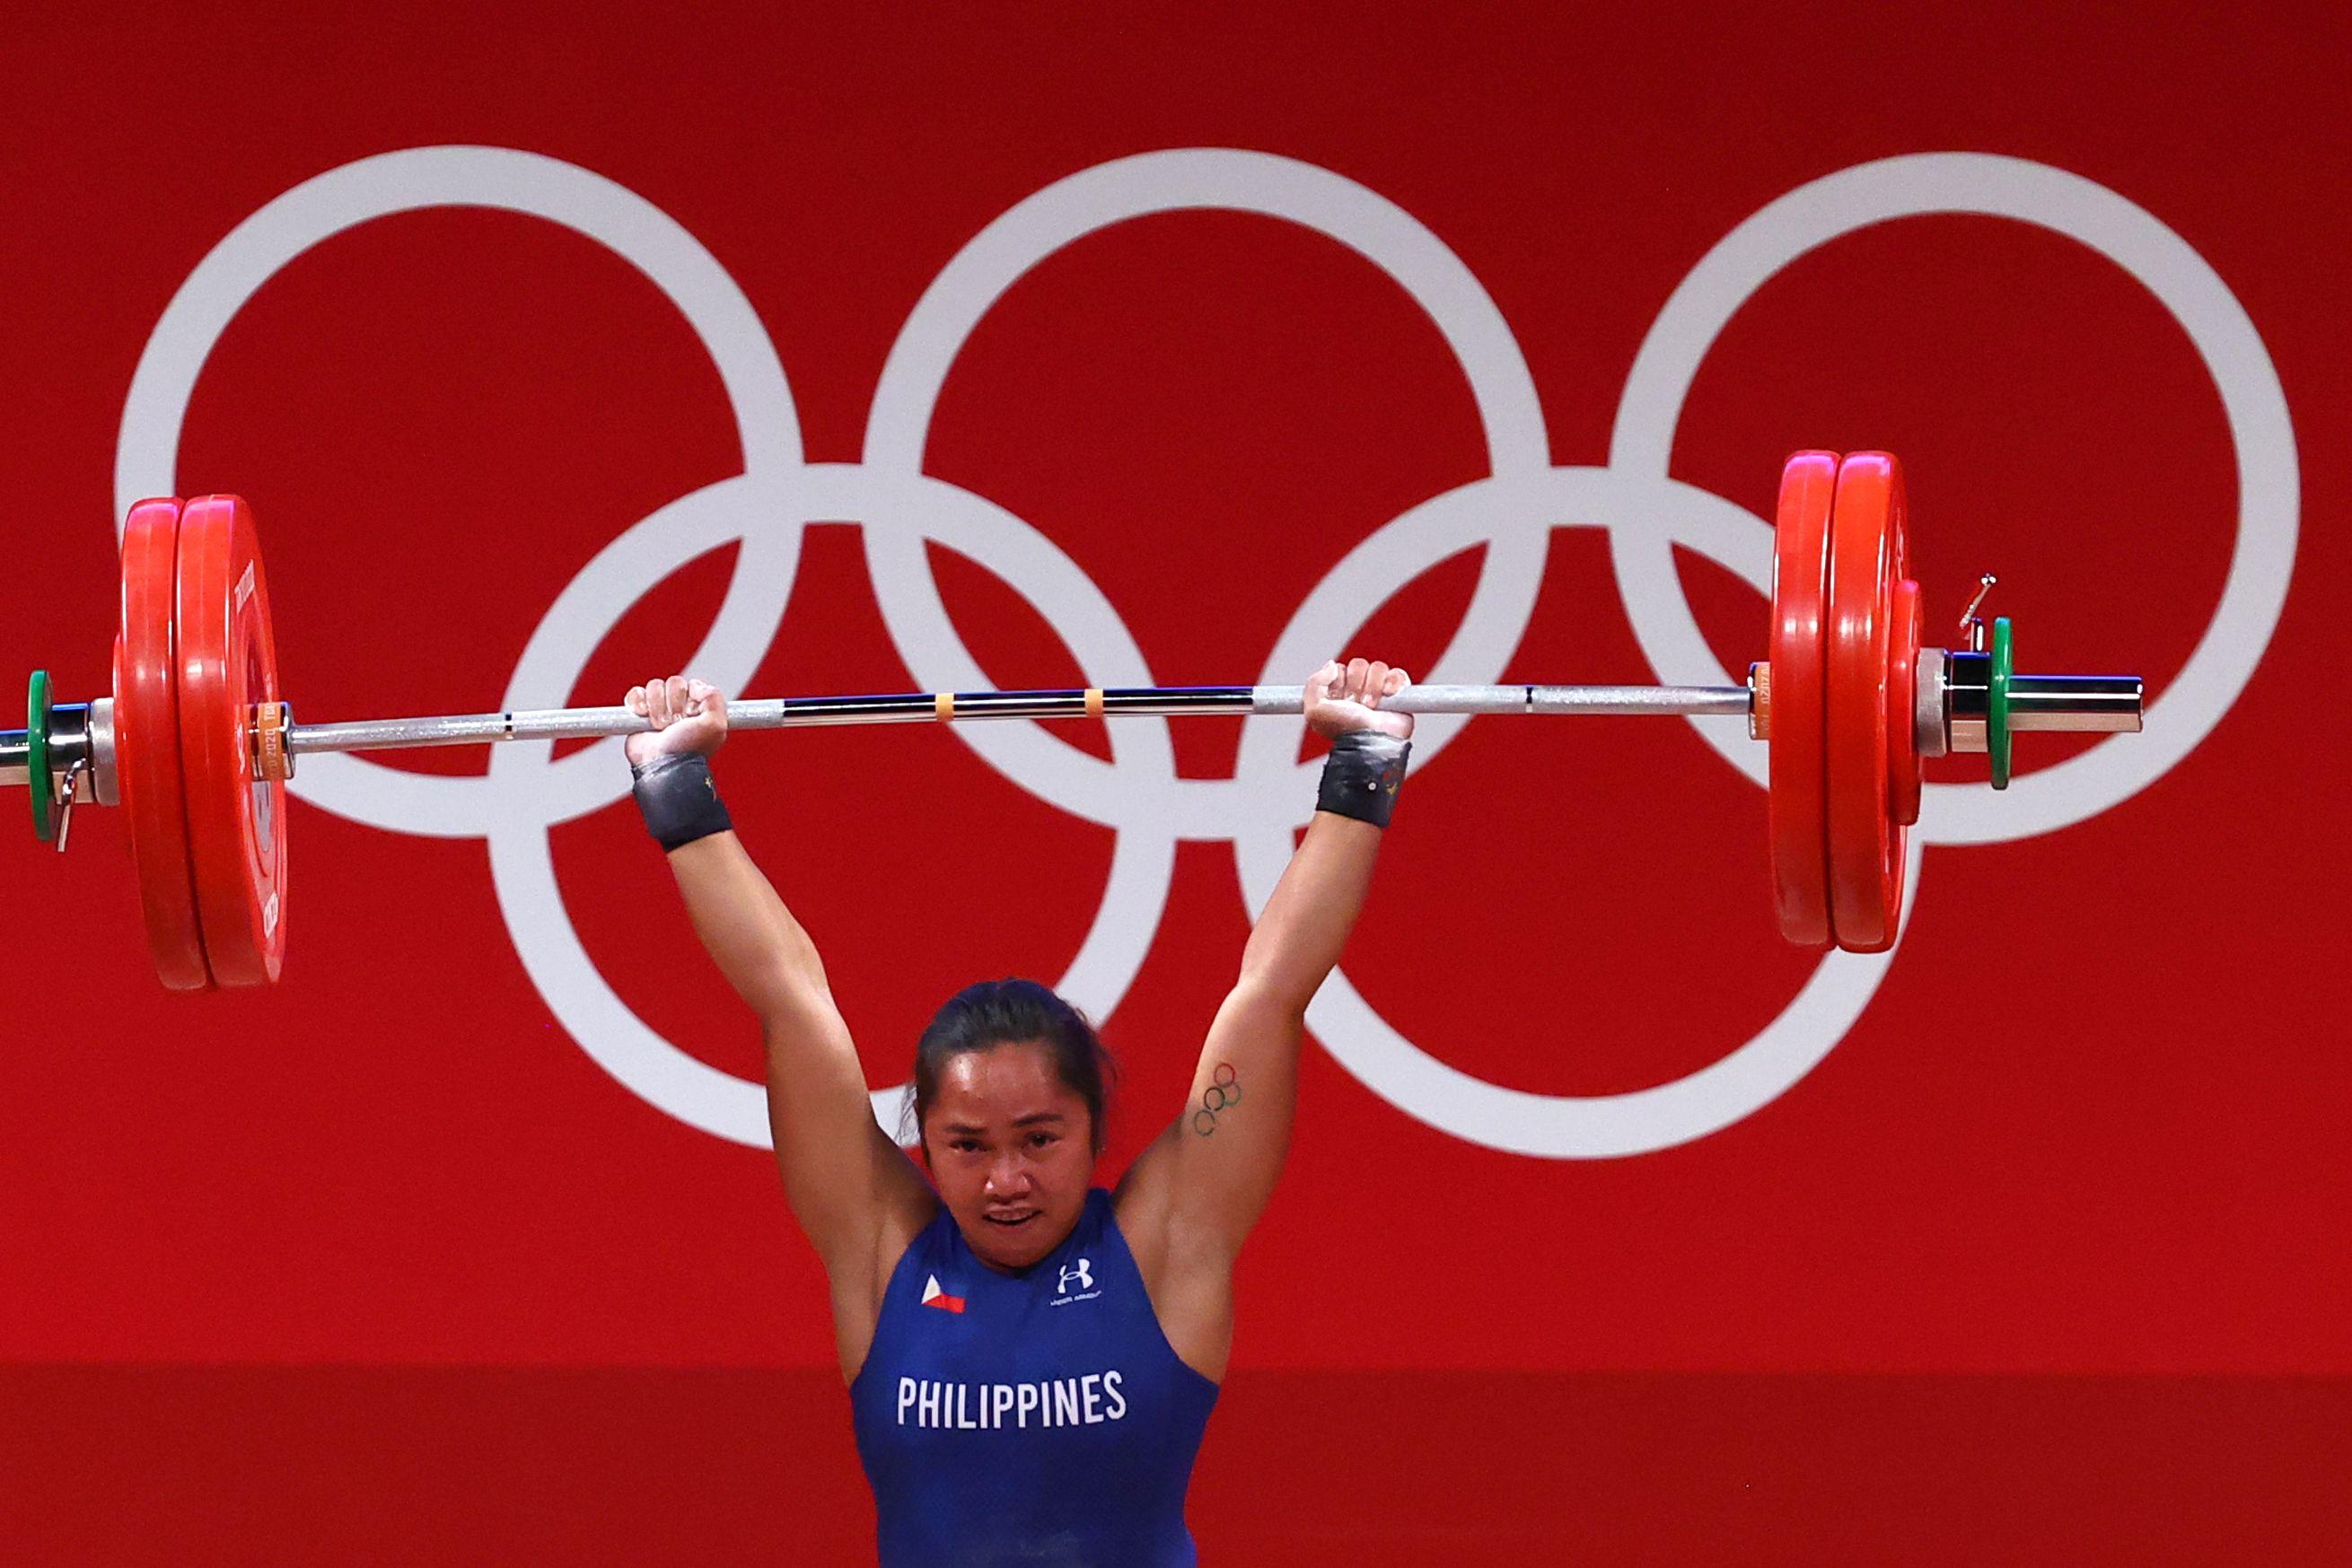 Tokyo 2020 Olympics - Weightlifting - Women's 55kg - Group A - Tokyo International Forum, Tokyo, Japan - July 26, 2021. Hidilyn Diaz of the Philippines in action. REUTERS/Edgard Garrido